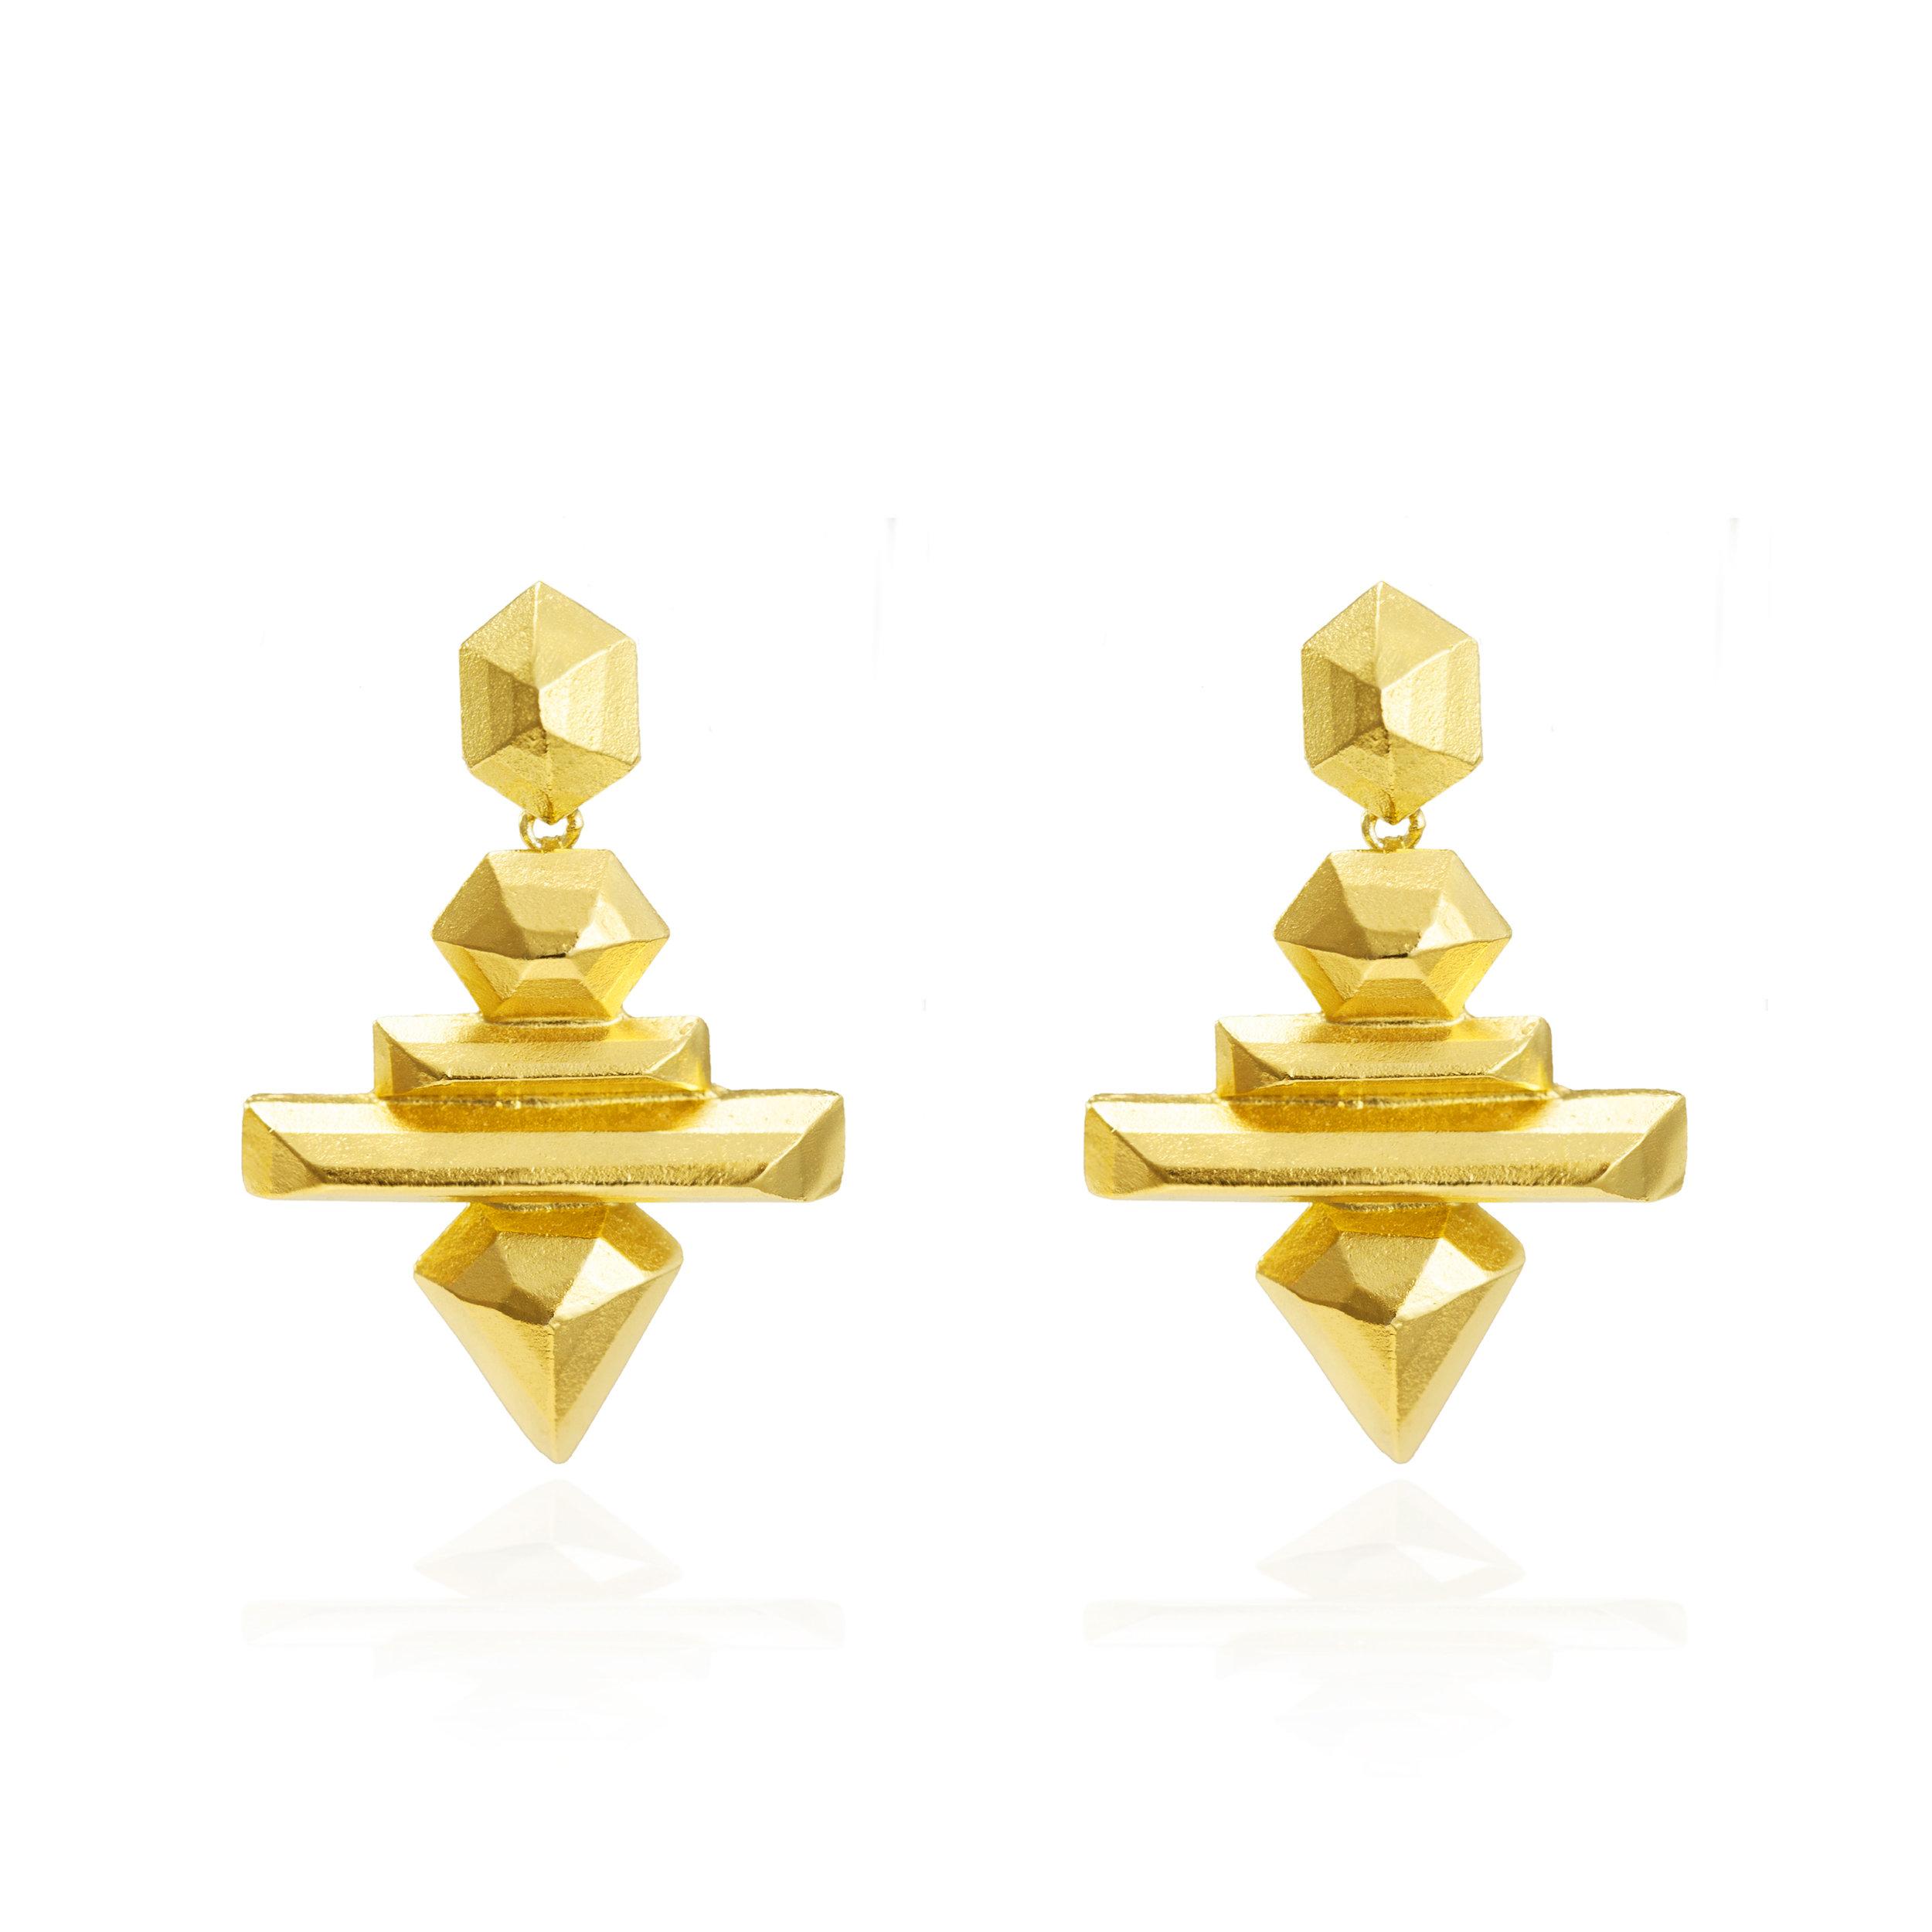 cosmo gold earrings.jpg